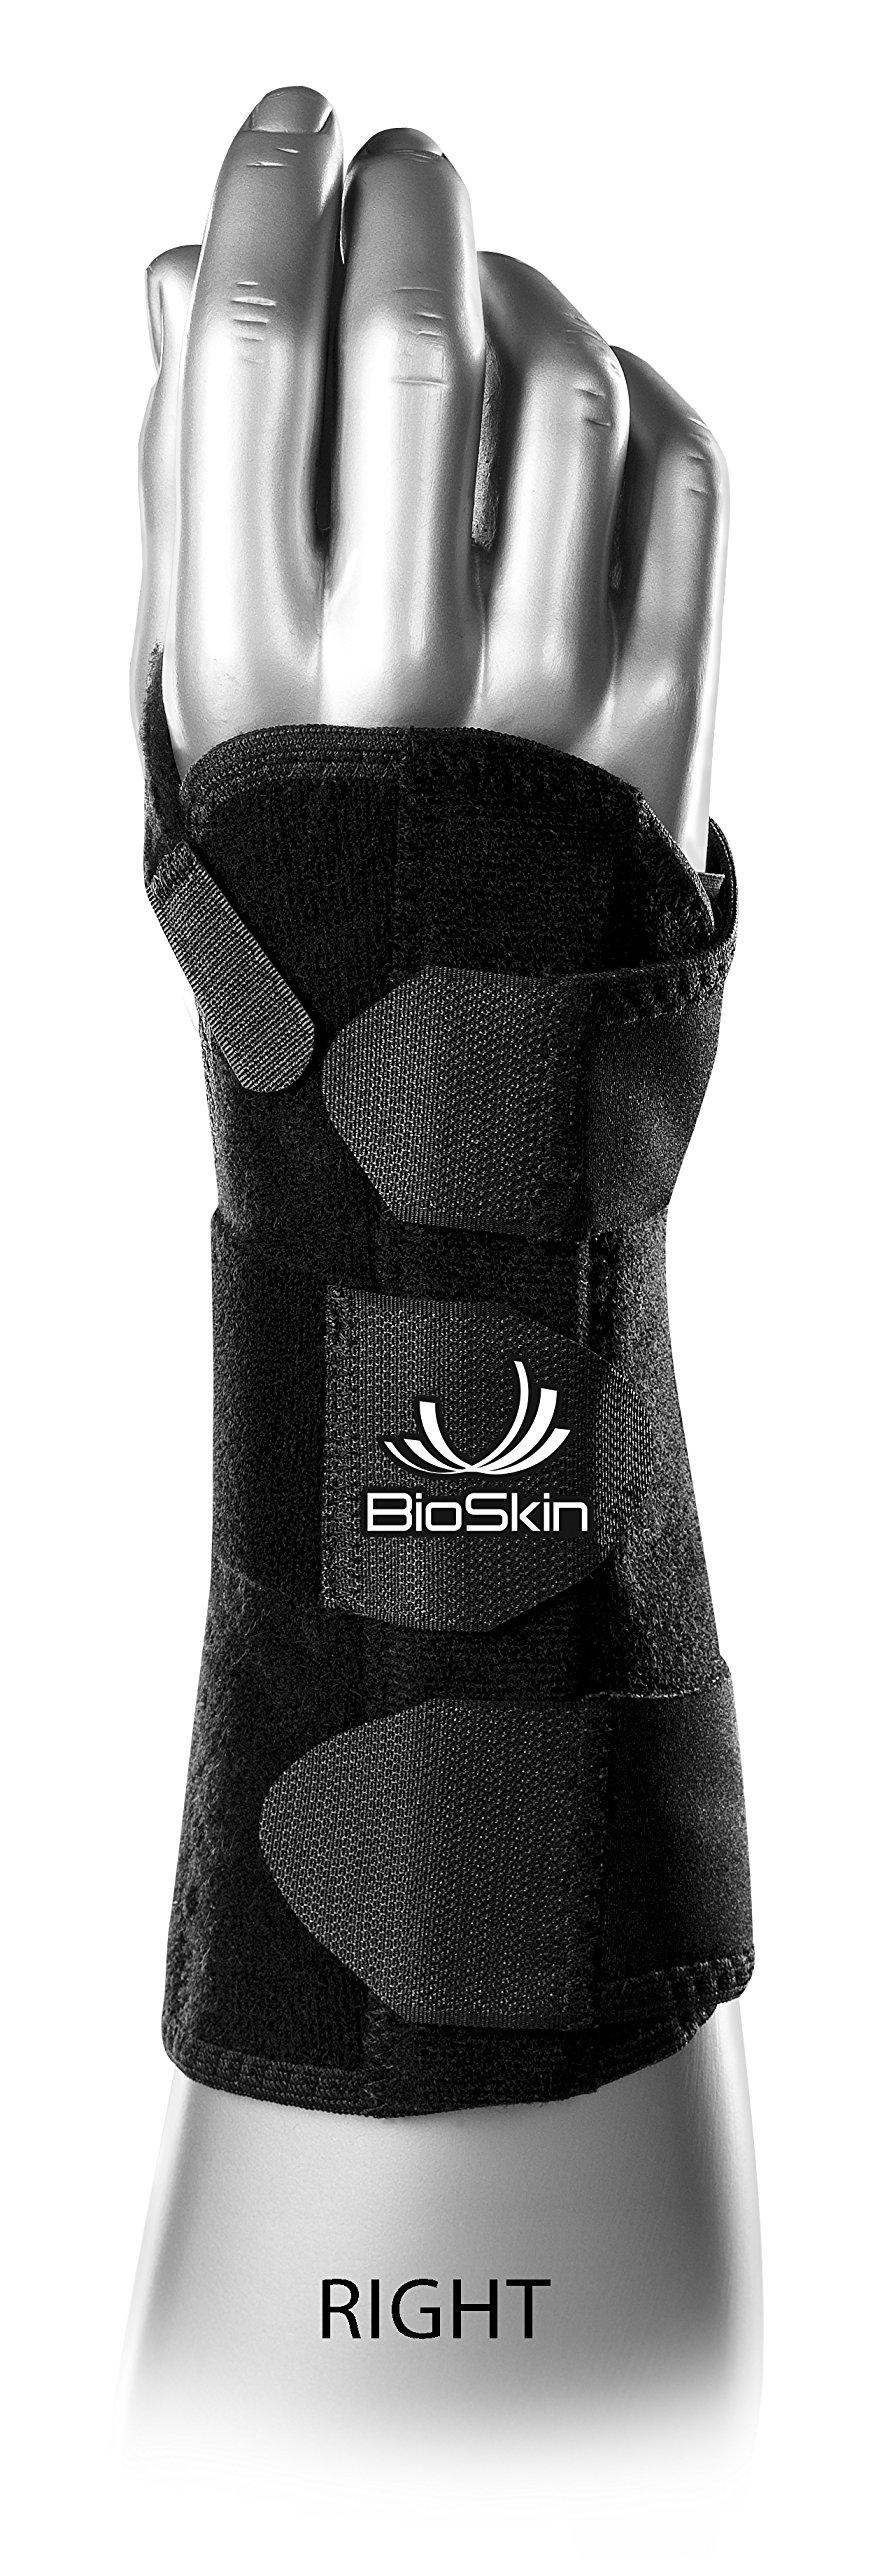 BioSkin DP3 Wrist Brace, Right, Medium/Large by BIOSKIN